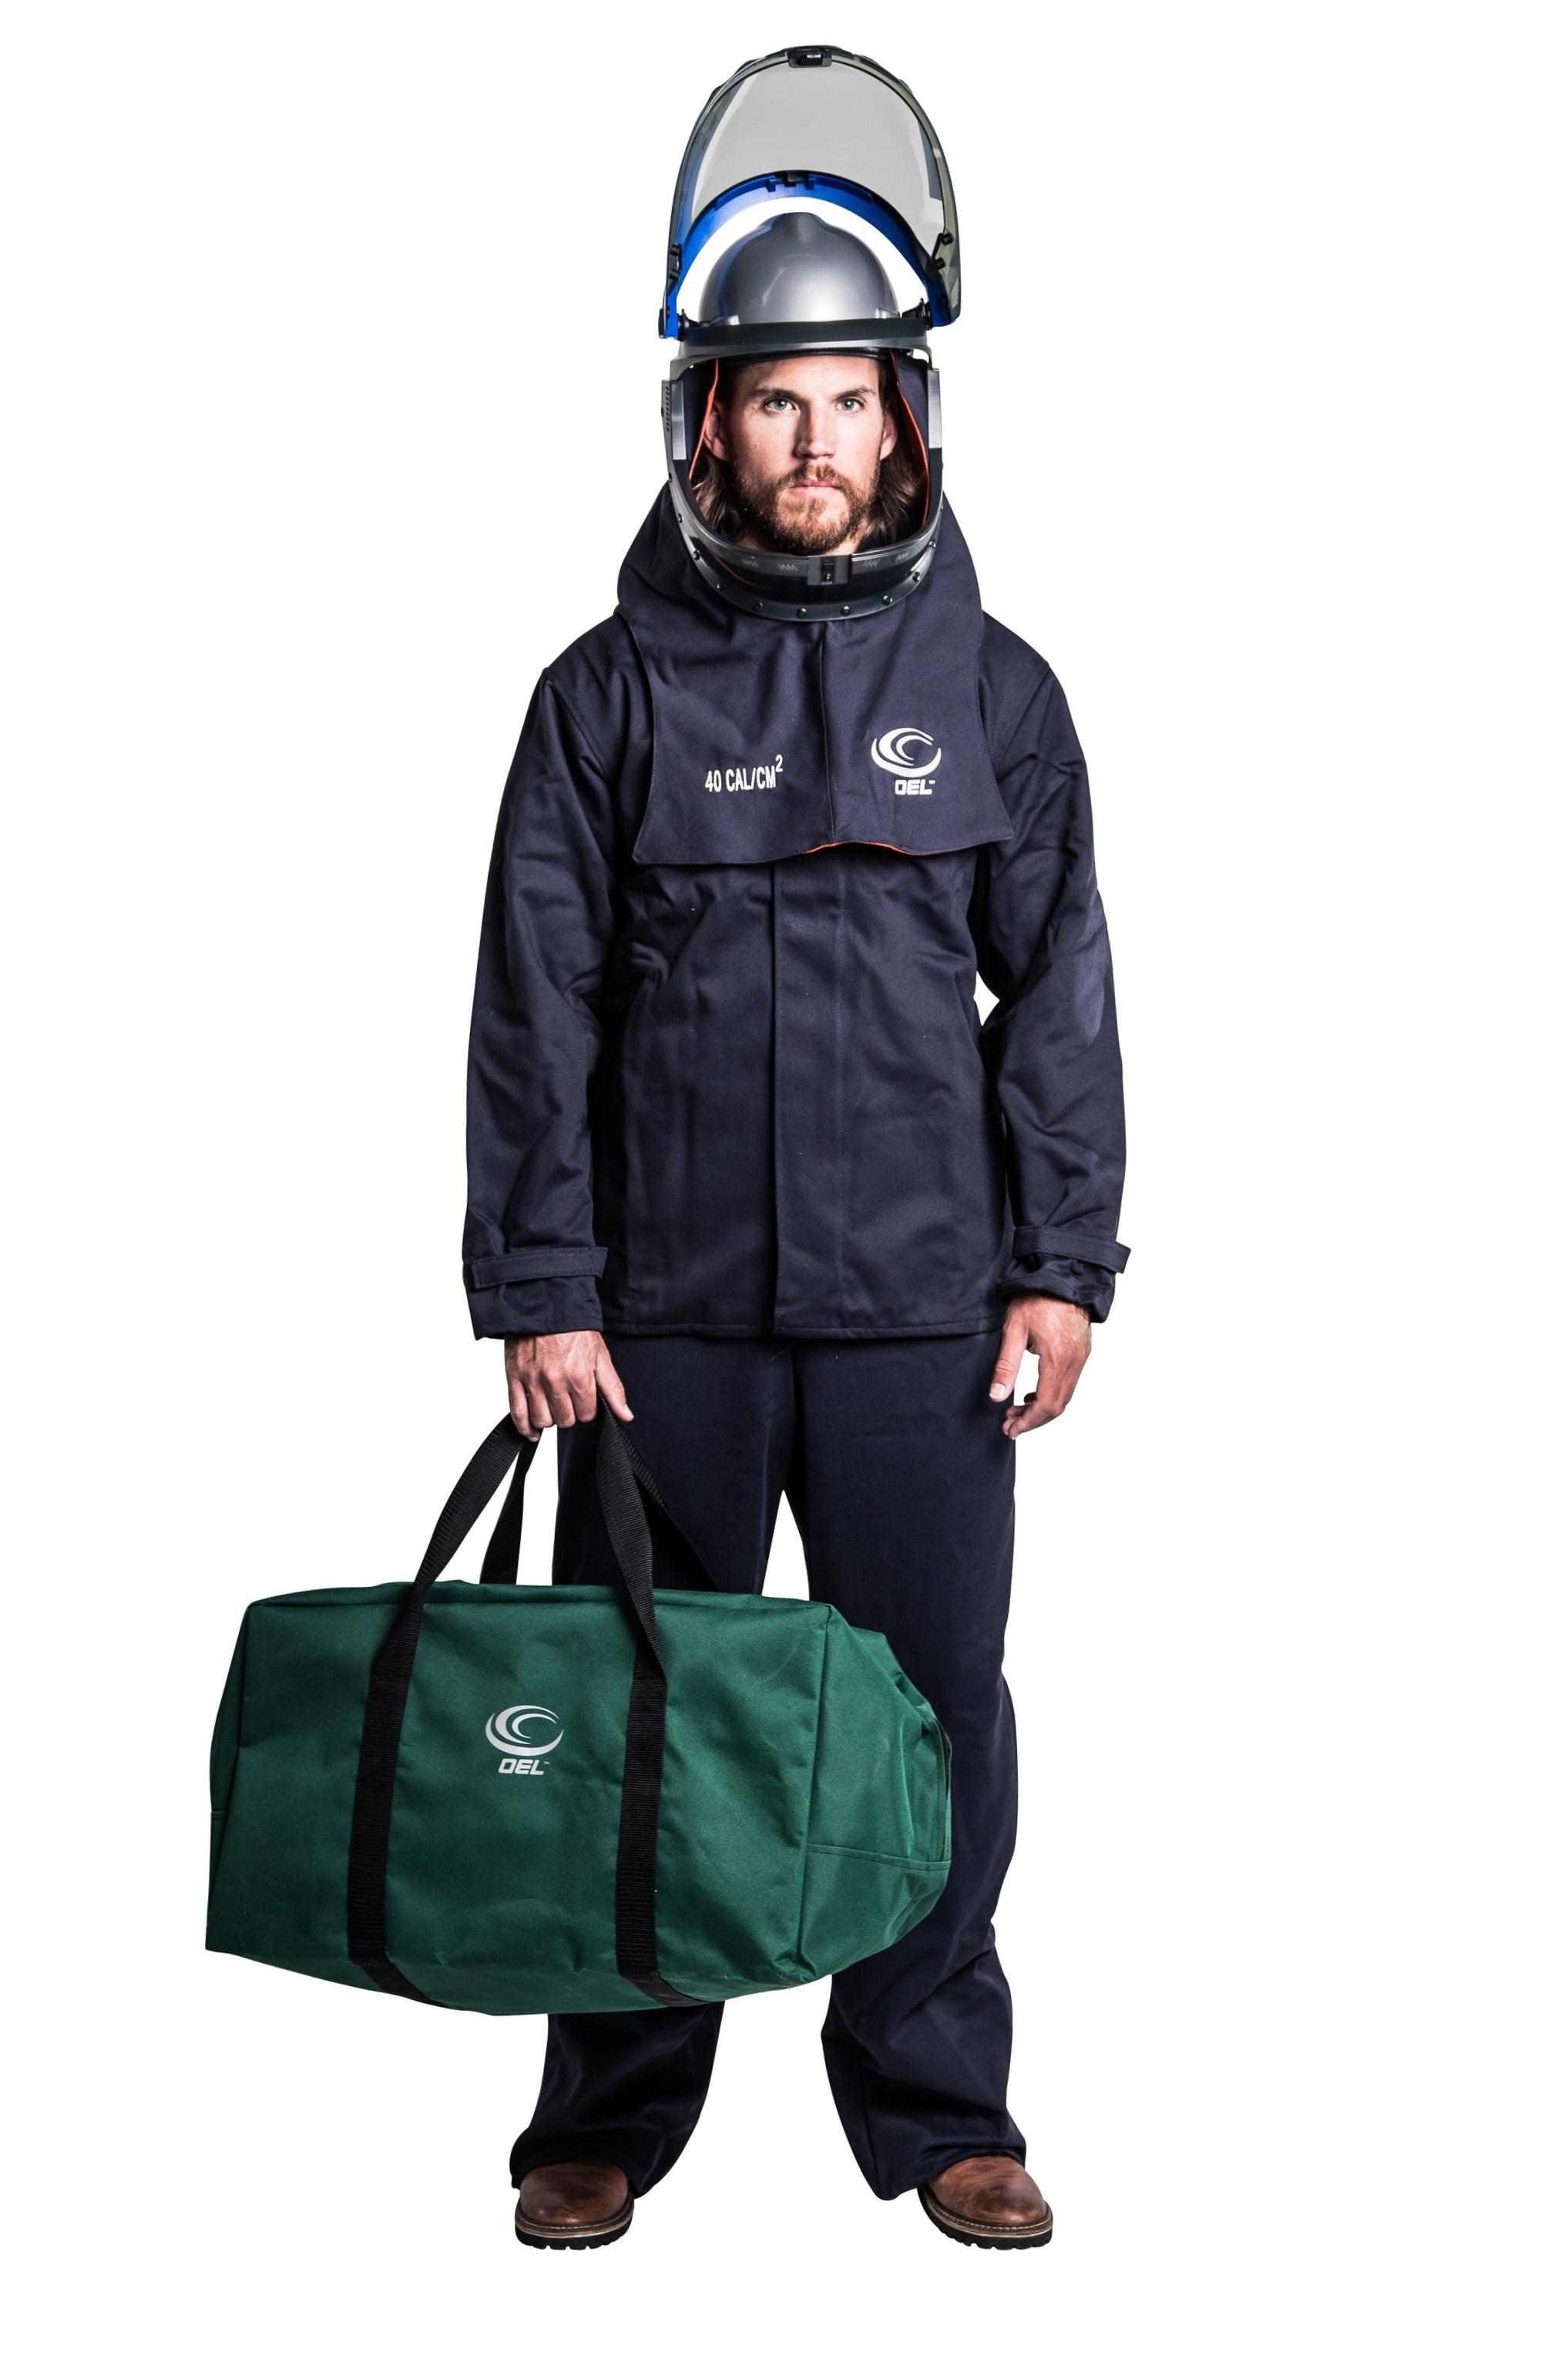 40 Cal Navy Jacket & Bib Kit with Lift-Front Hood